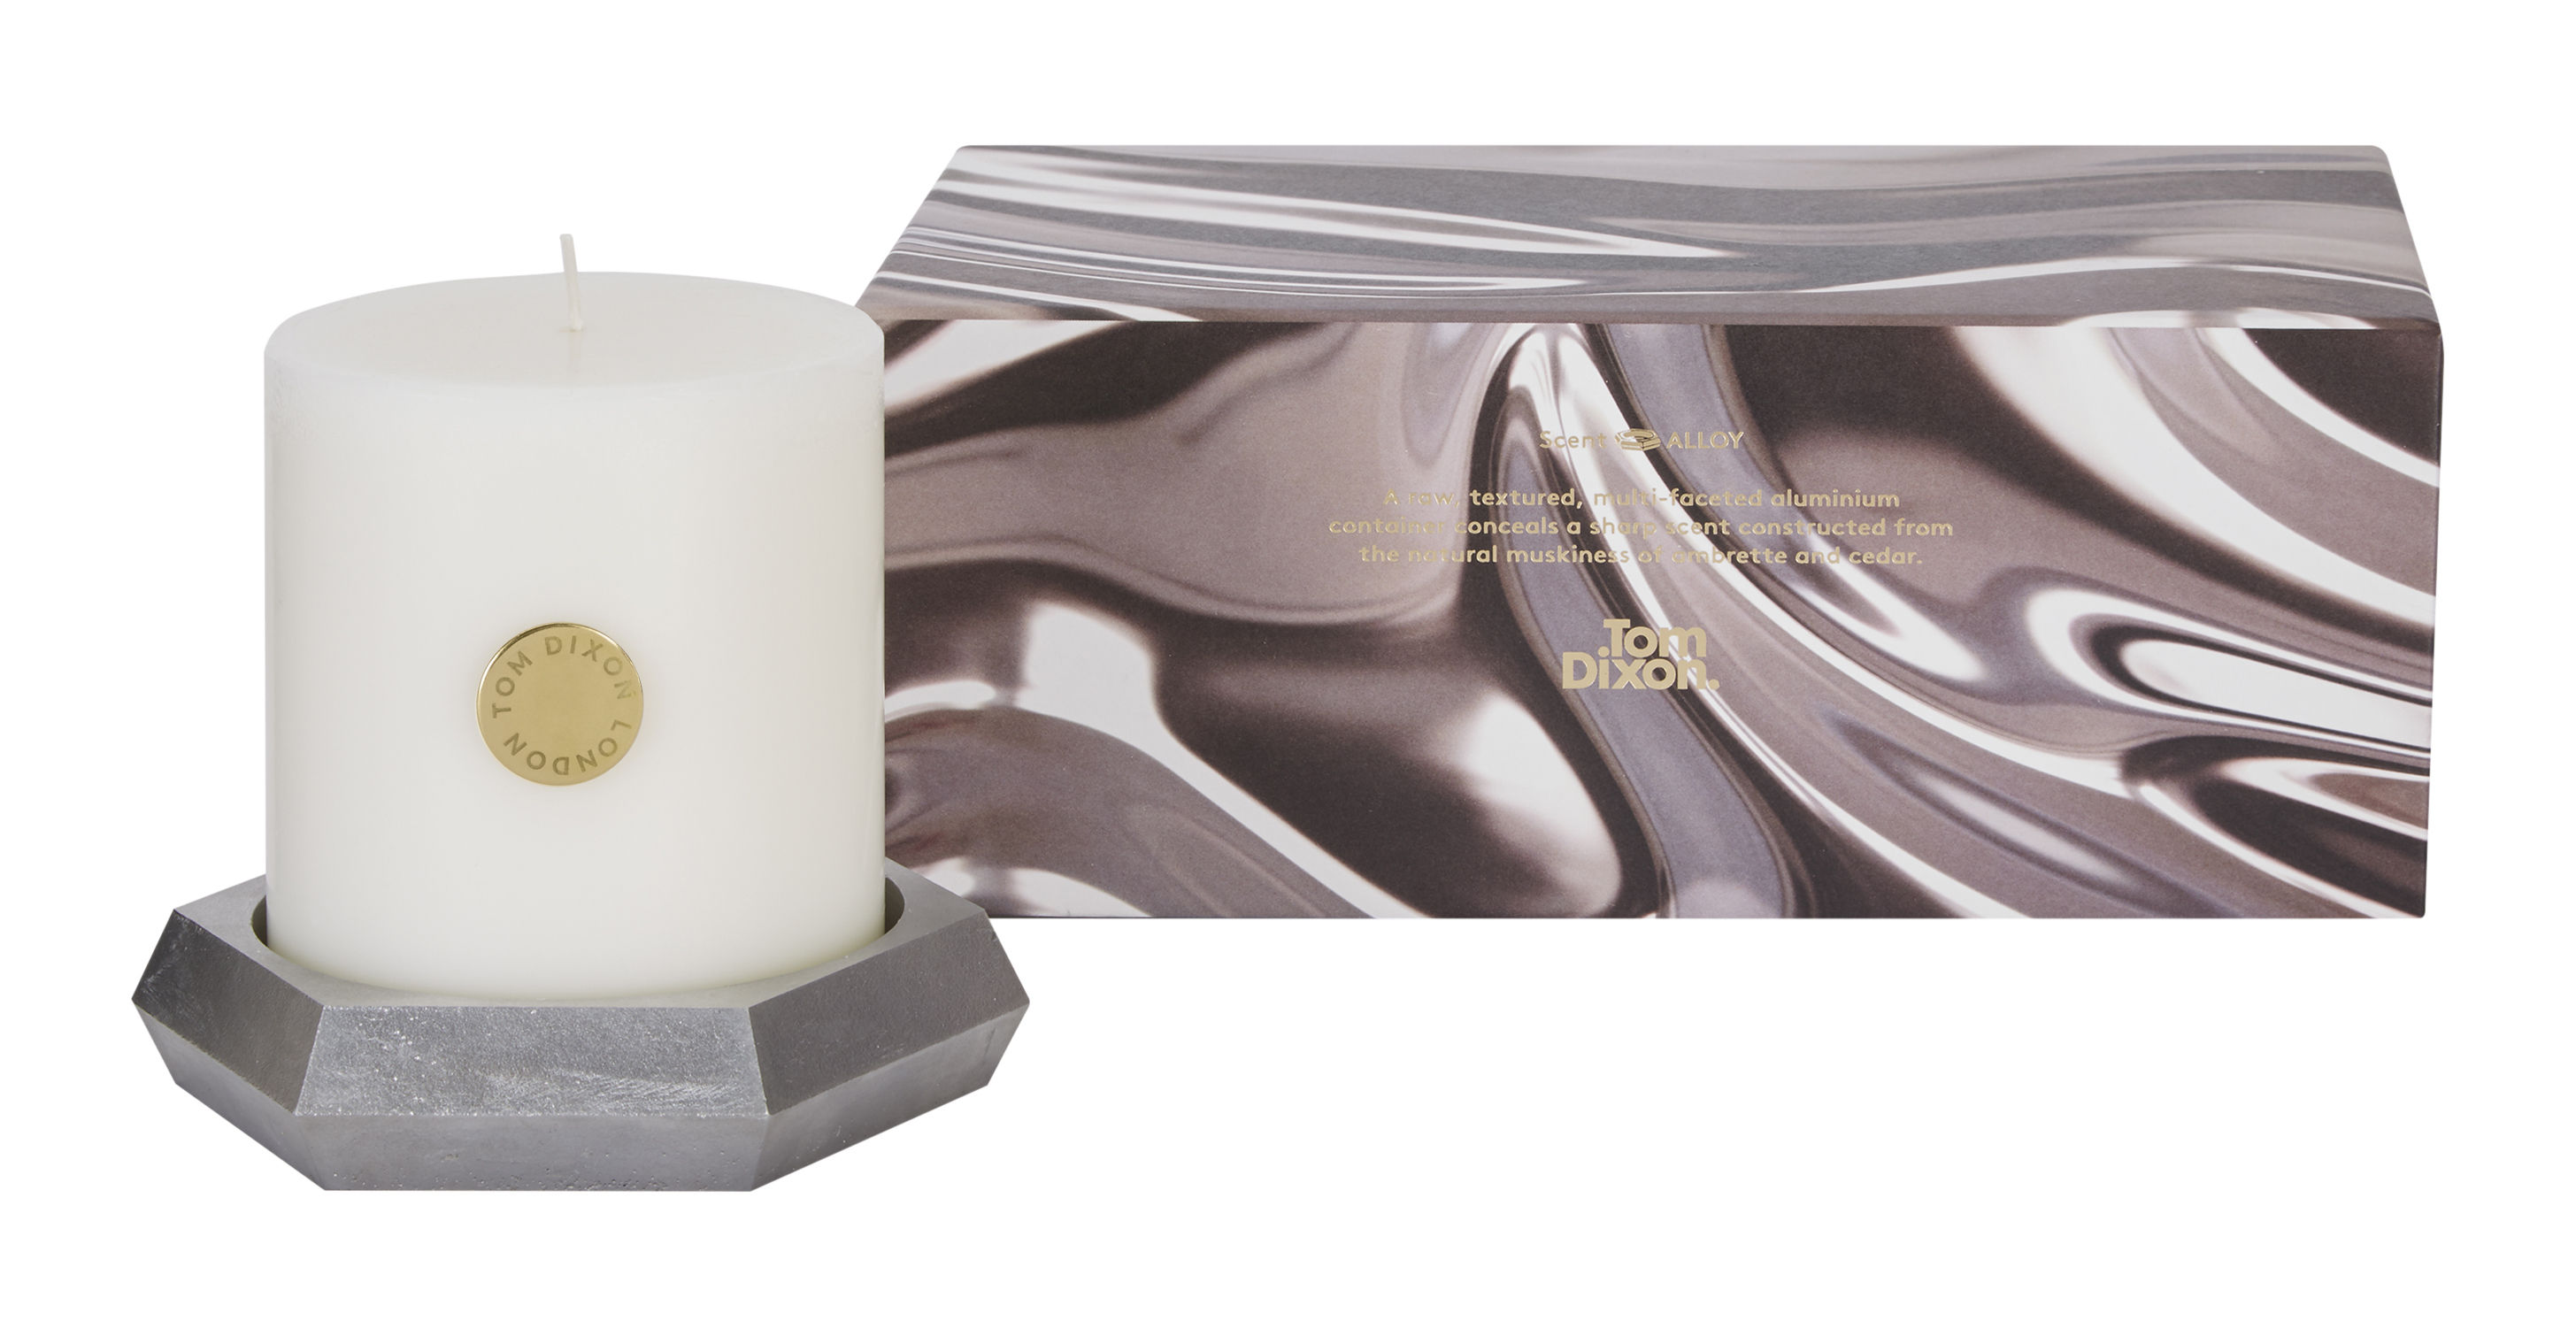 alloy pillar set aus kerze kerzenst nder aus aluminiumguss tom dixon parfumierte kerze. Black Bedroom Furniture Sets. Home Design Ideas